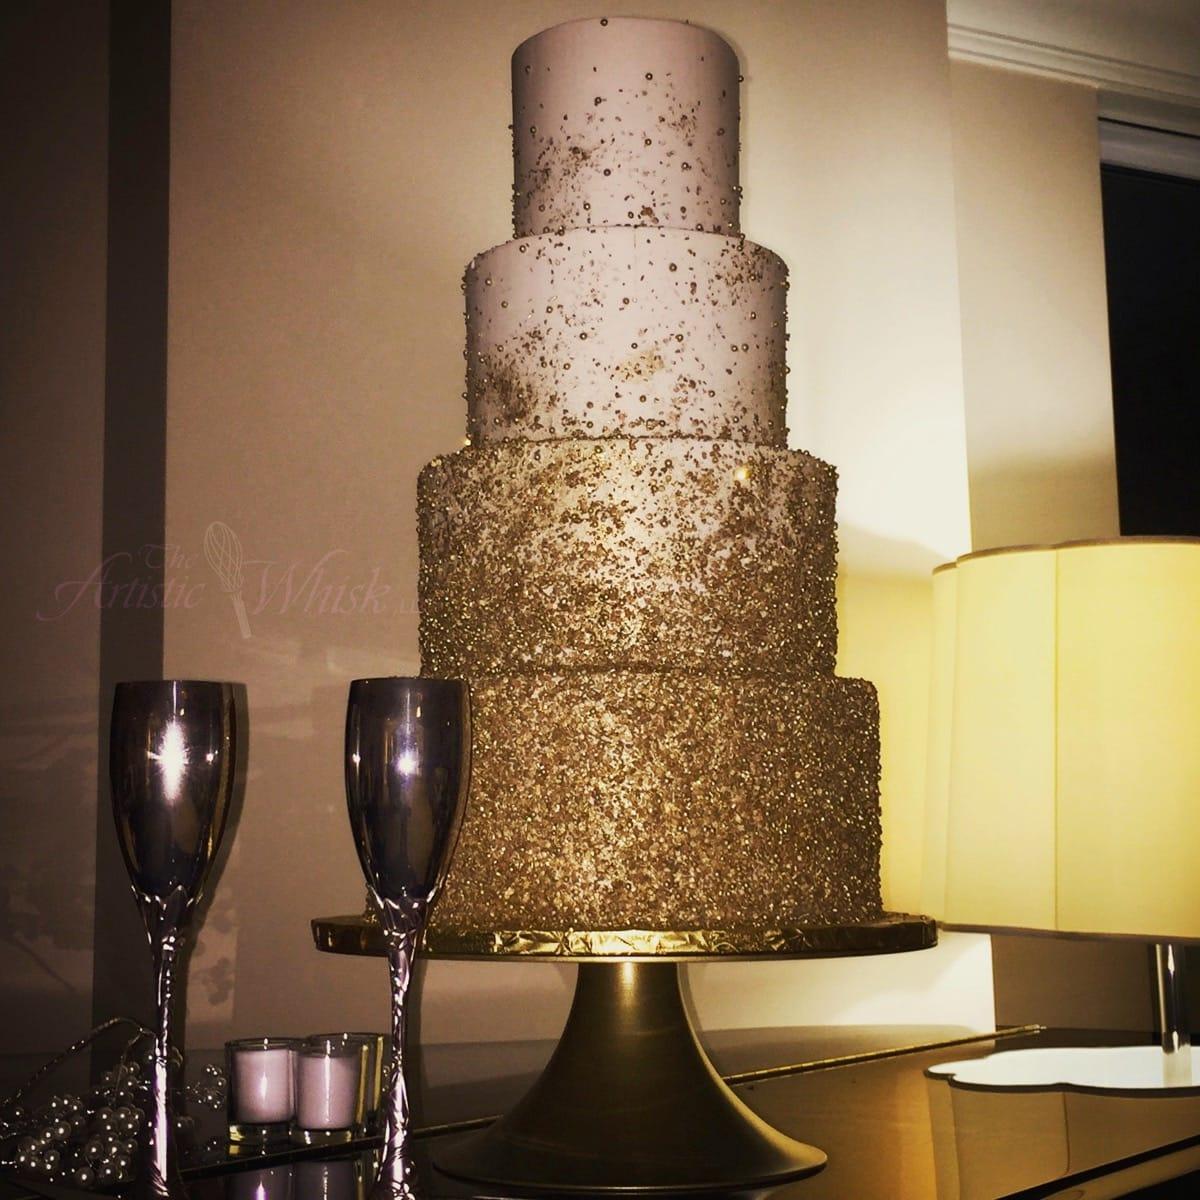 new-years-wedding---gold-sparkle-texture---buttercream-io-02-45-58-549-io.jpg